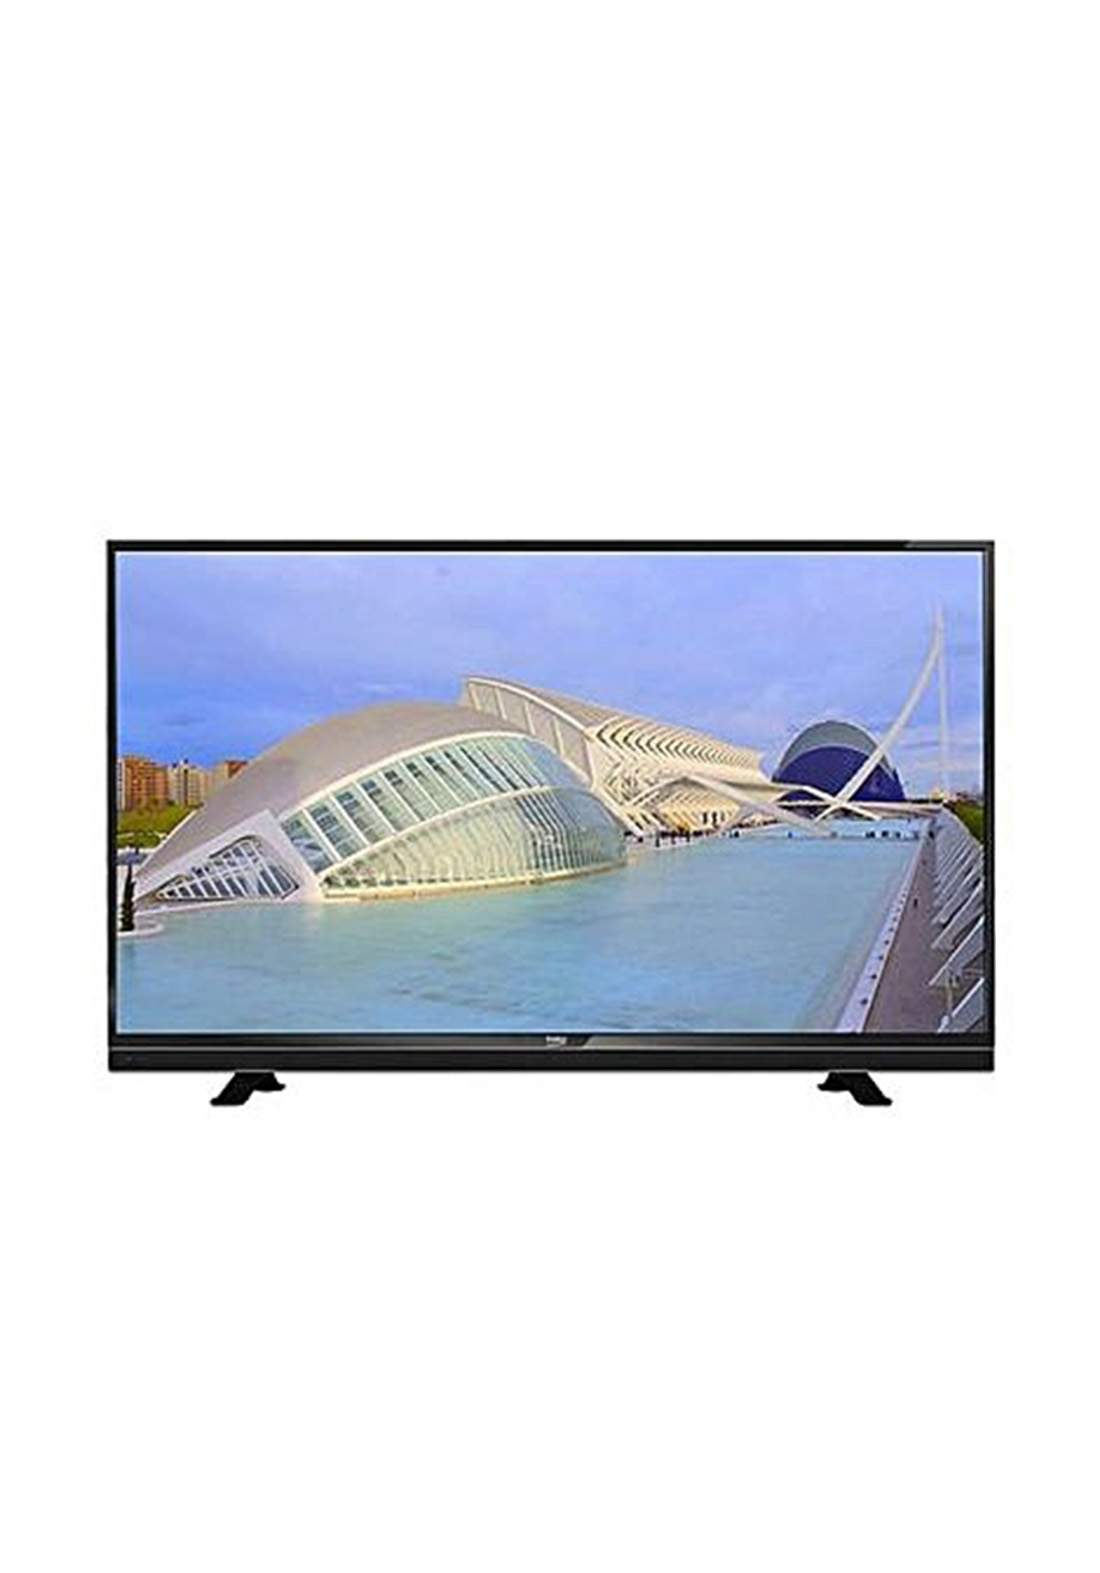 Beko LED55-840BH Full HD Smart Television 55 Inch - Black  شاشة